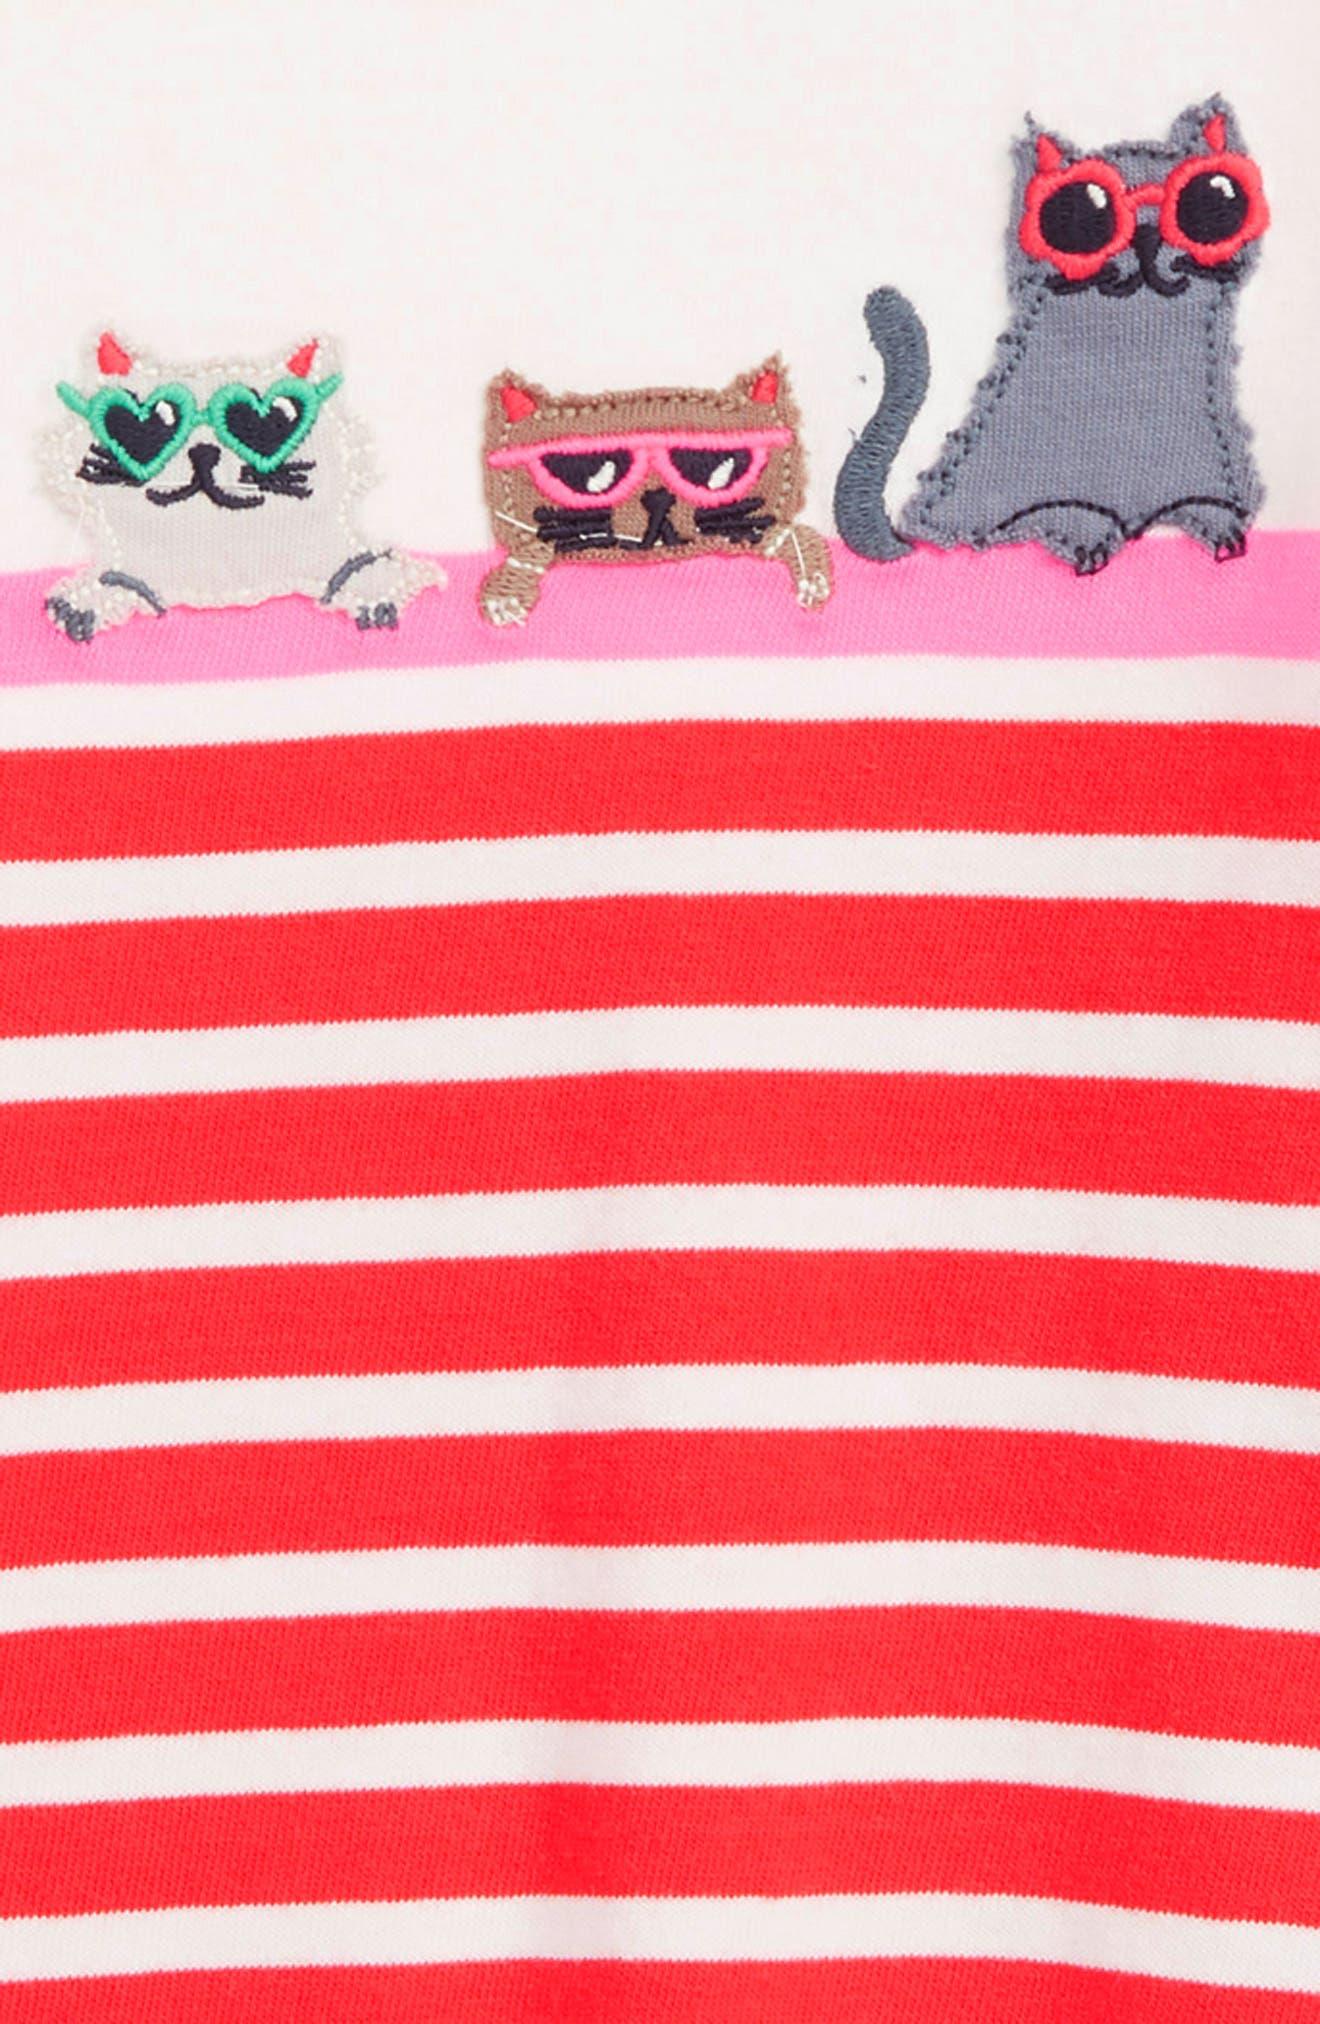 MINI BODEN,                             Stripe Appliqué Tunic,                             Alternate thumbnail 2, color,                             614